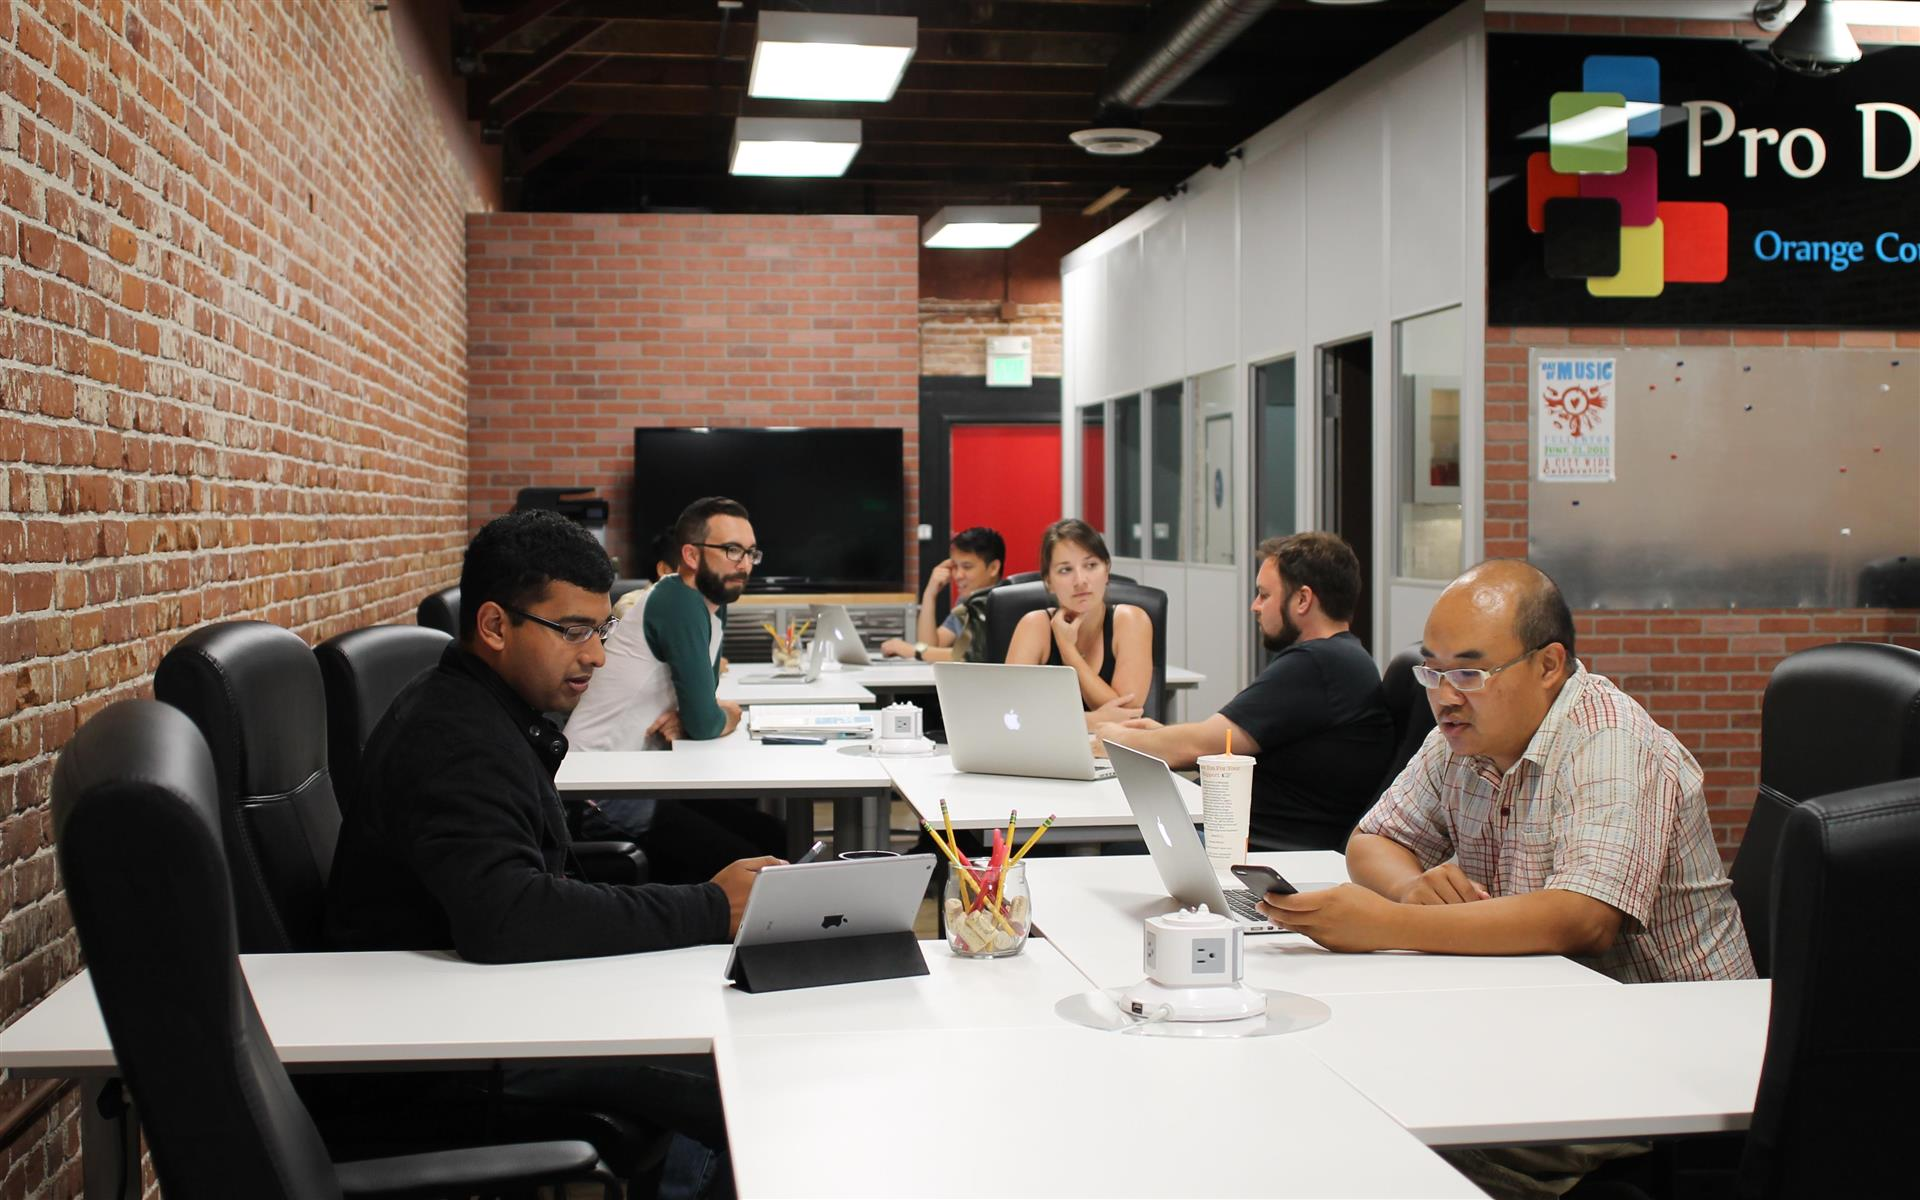 Pro Desk Space - Open Desk - 12 Day Pass